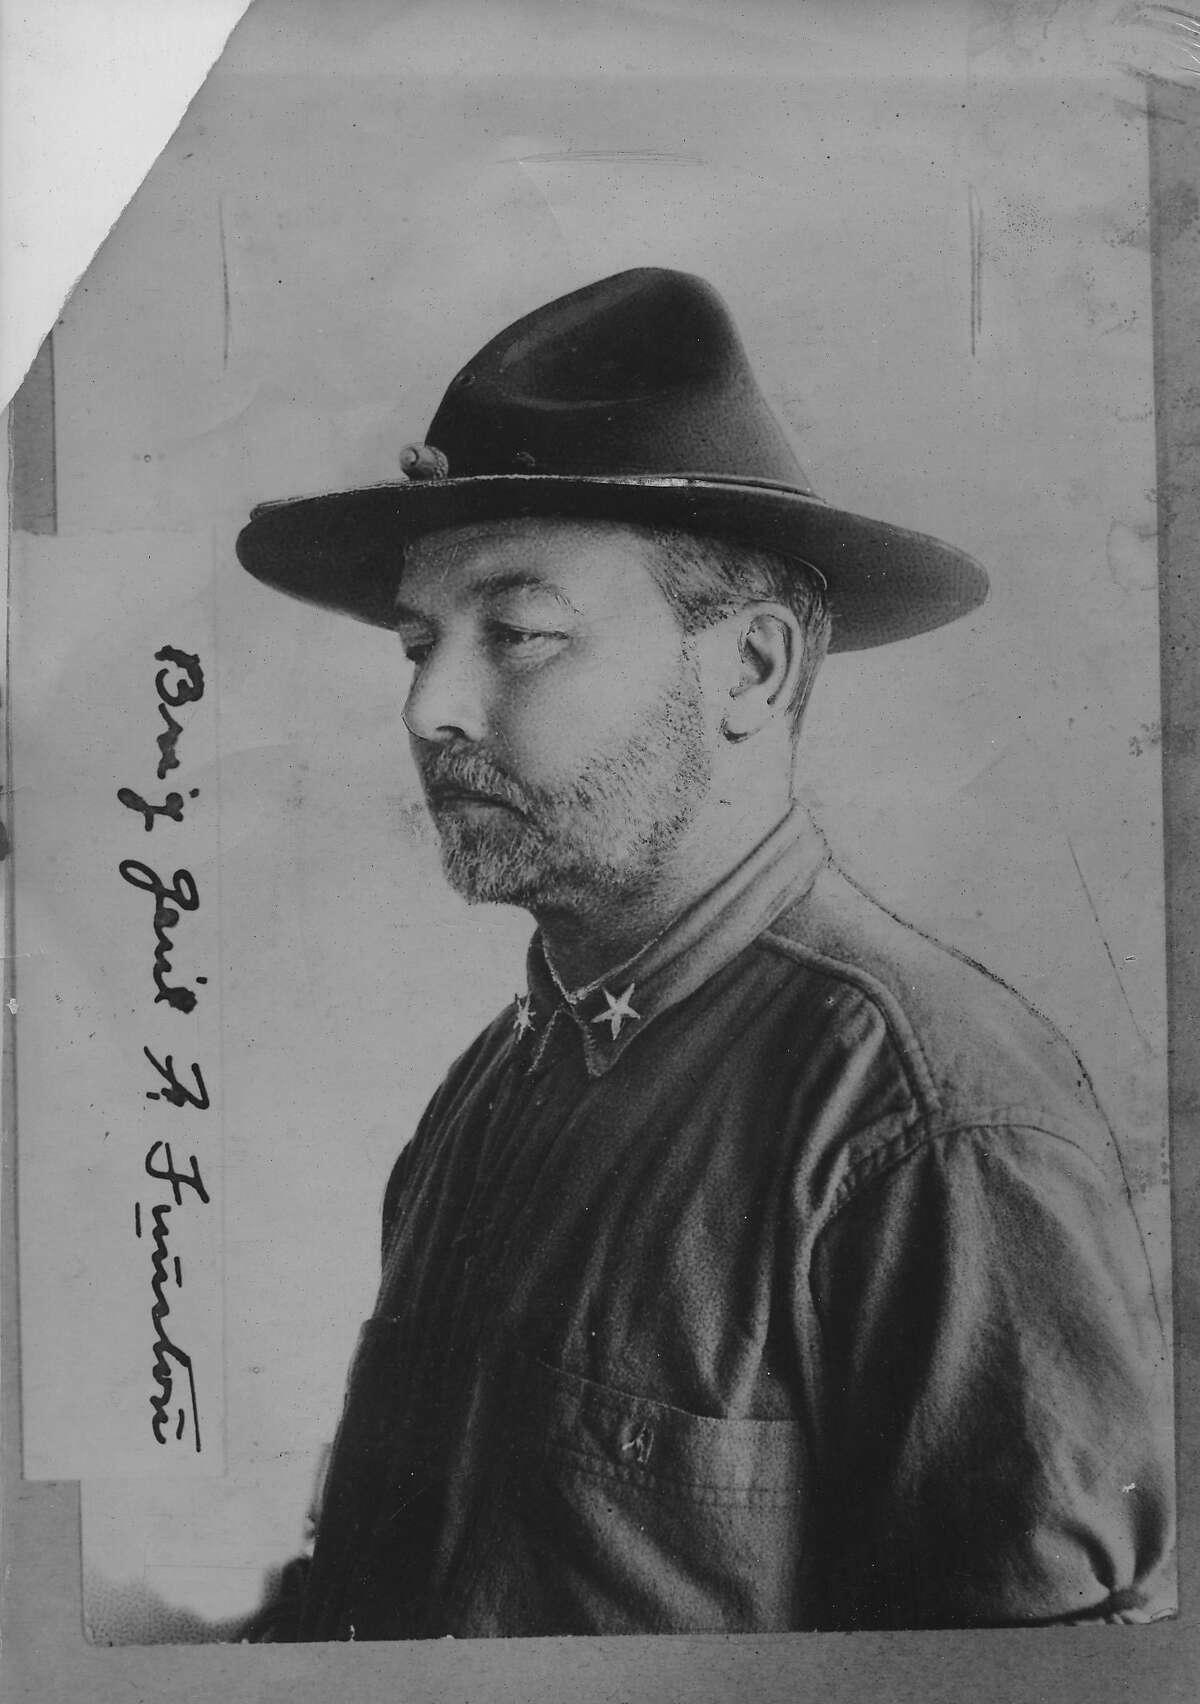 Brigadier General Frederick Funston Handout?